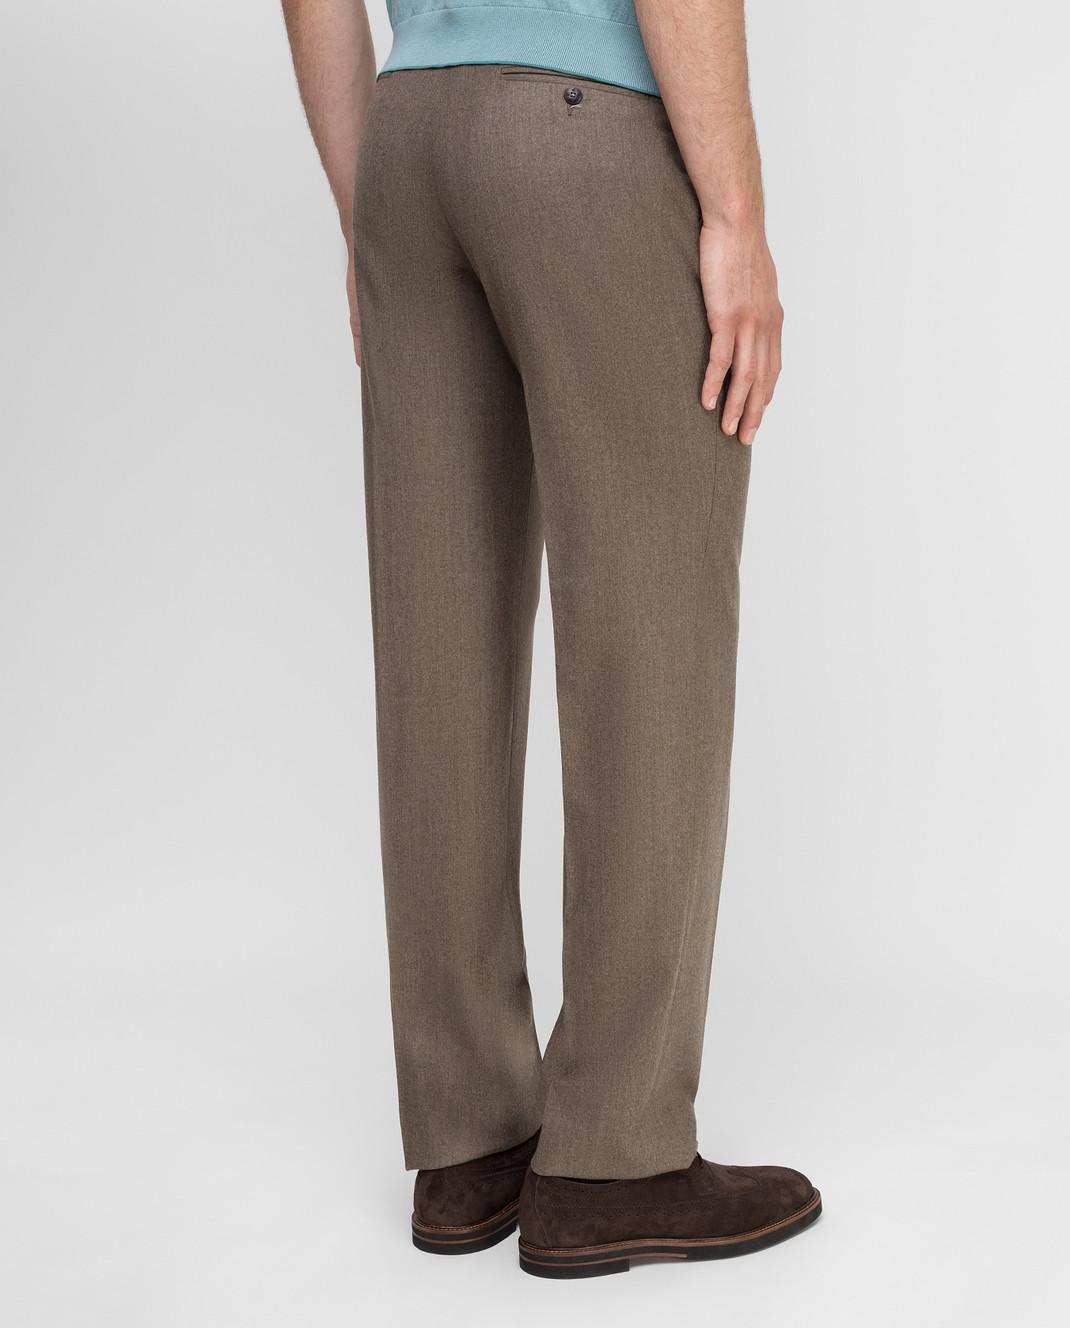 Castello d'Oro Бежевые брюки из шерсти изображение 4